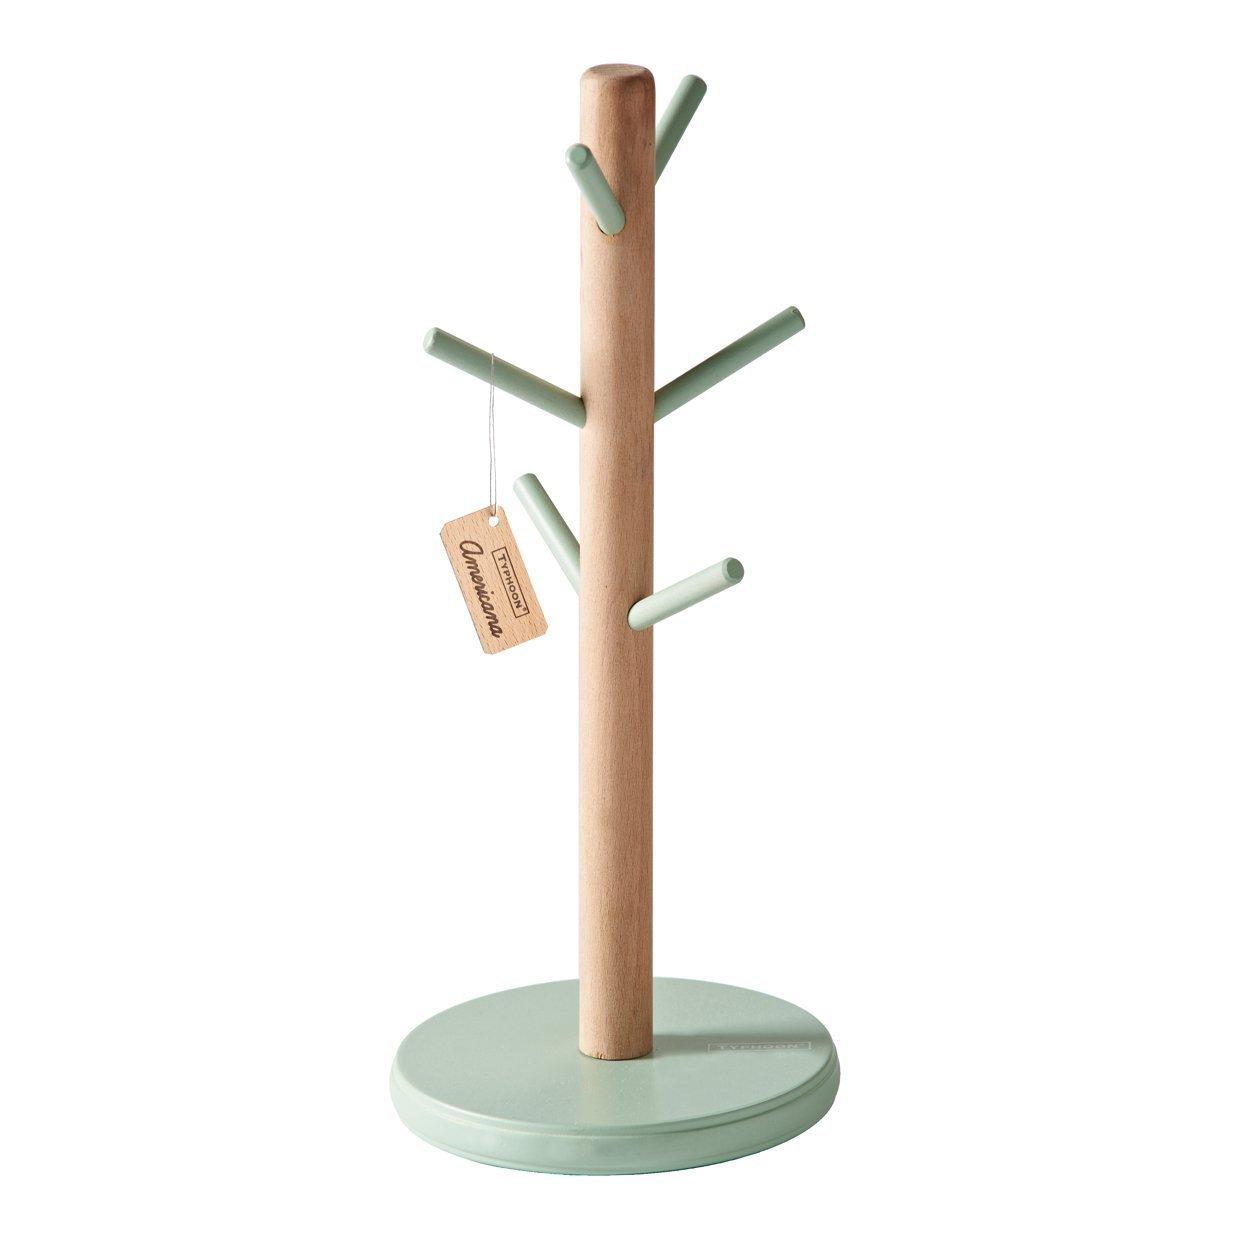 Typhoon vintage americana Kitchen mug Tree Holder, legno, bianco, 13.6x 13.6x 31.5cm 1400.843